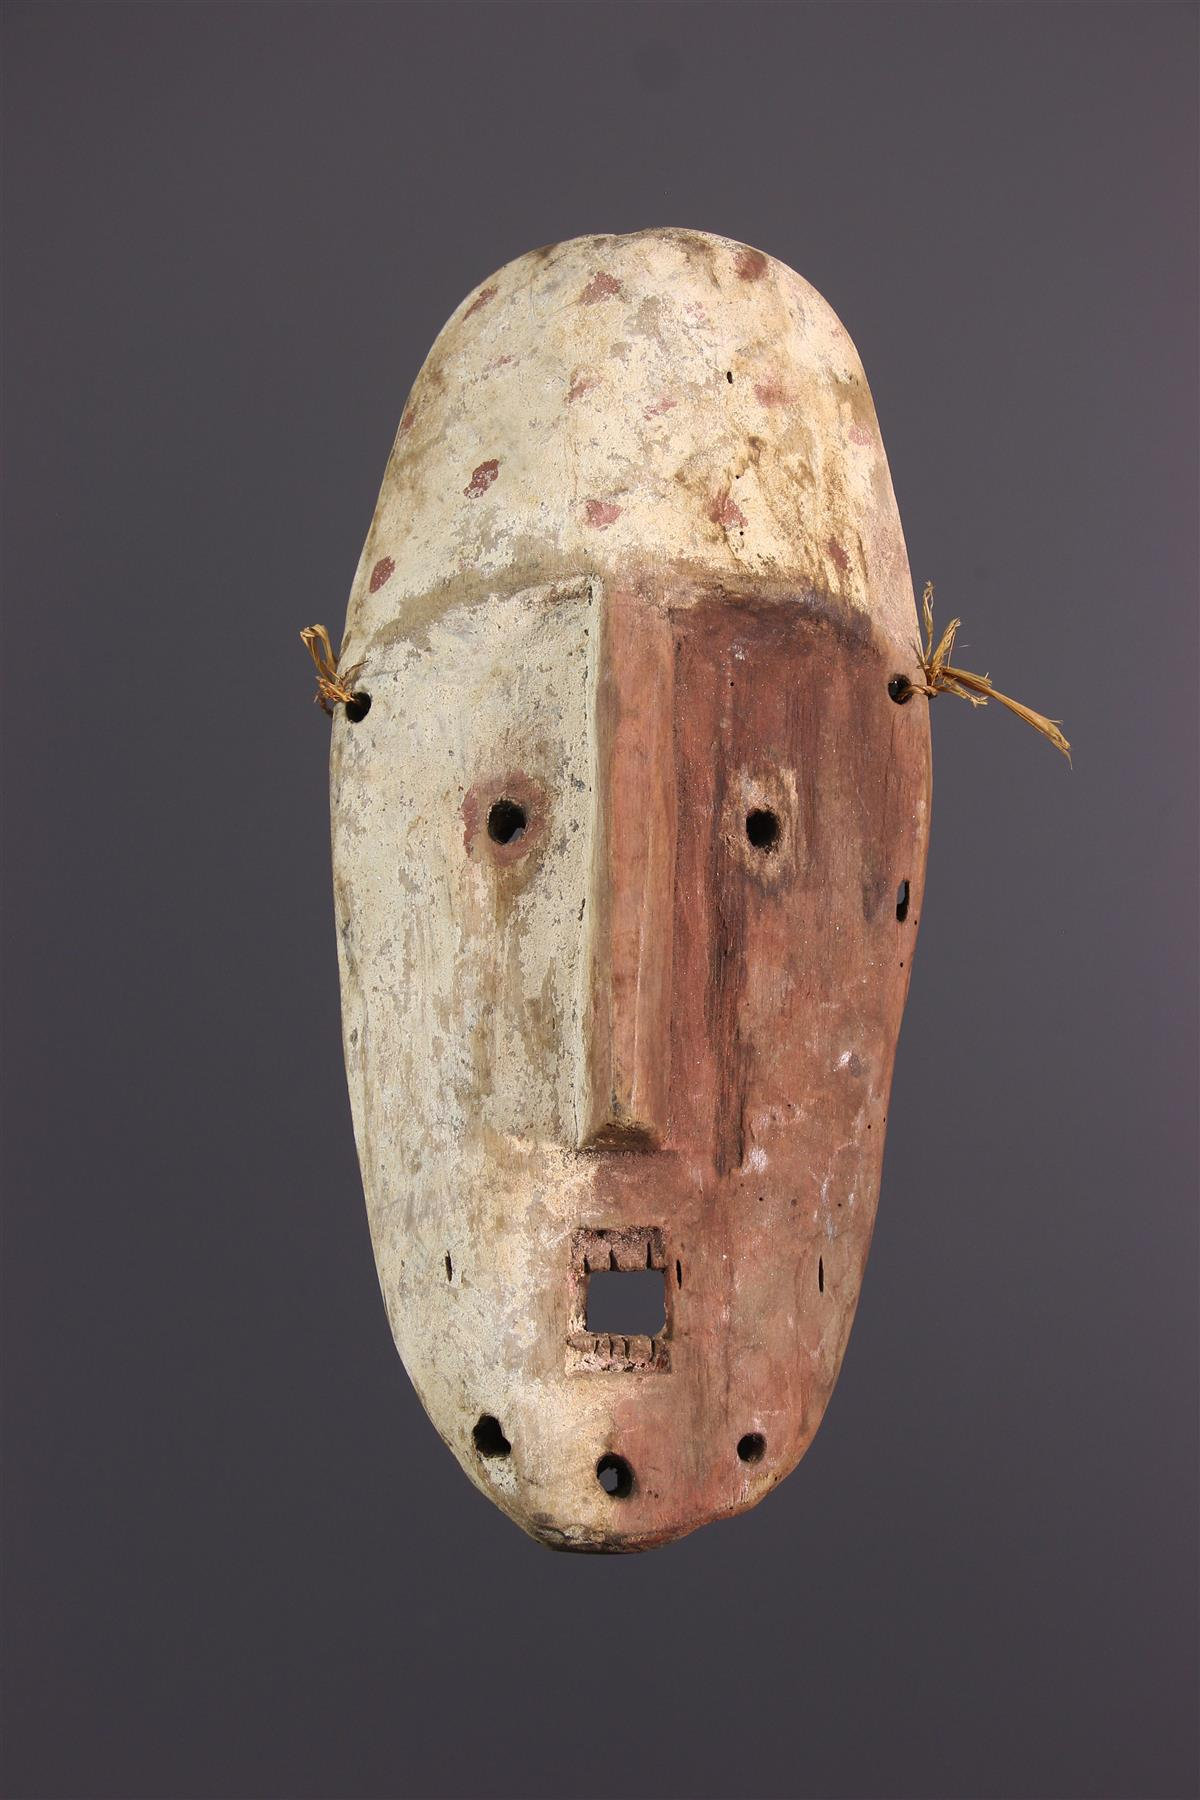 Lengola Mask - African art